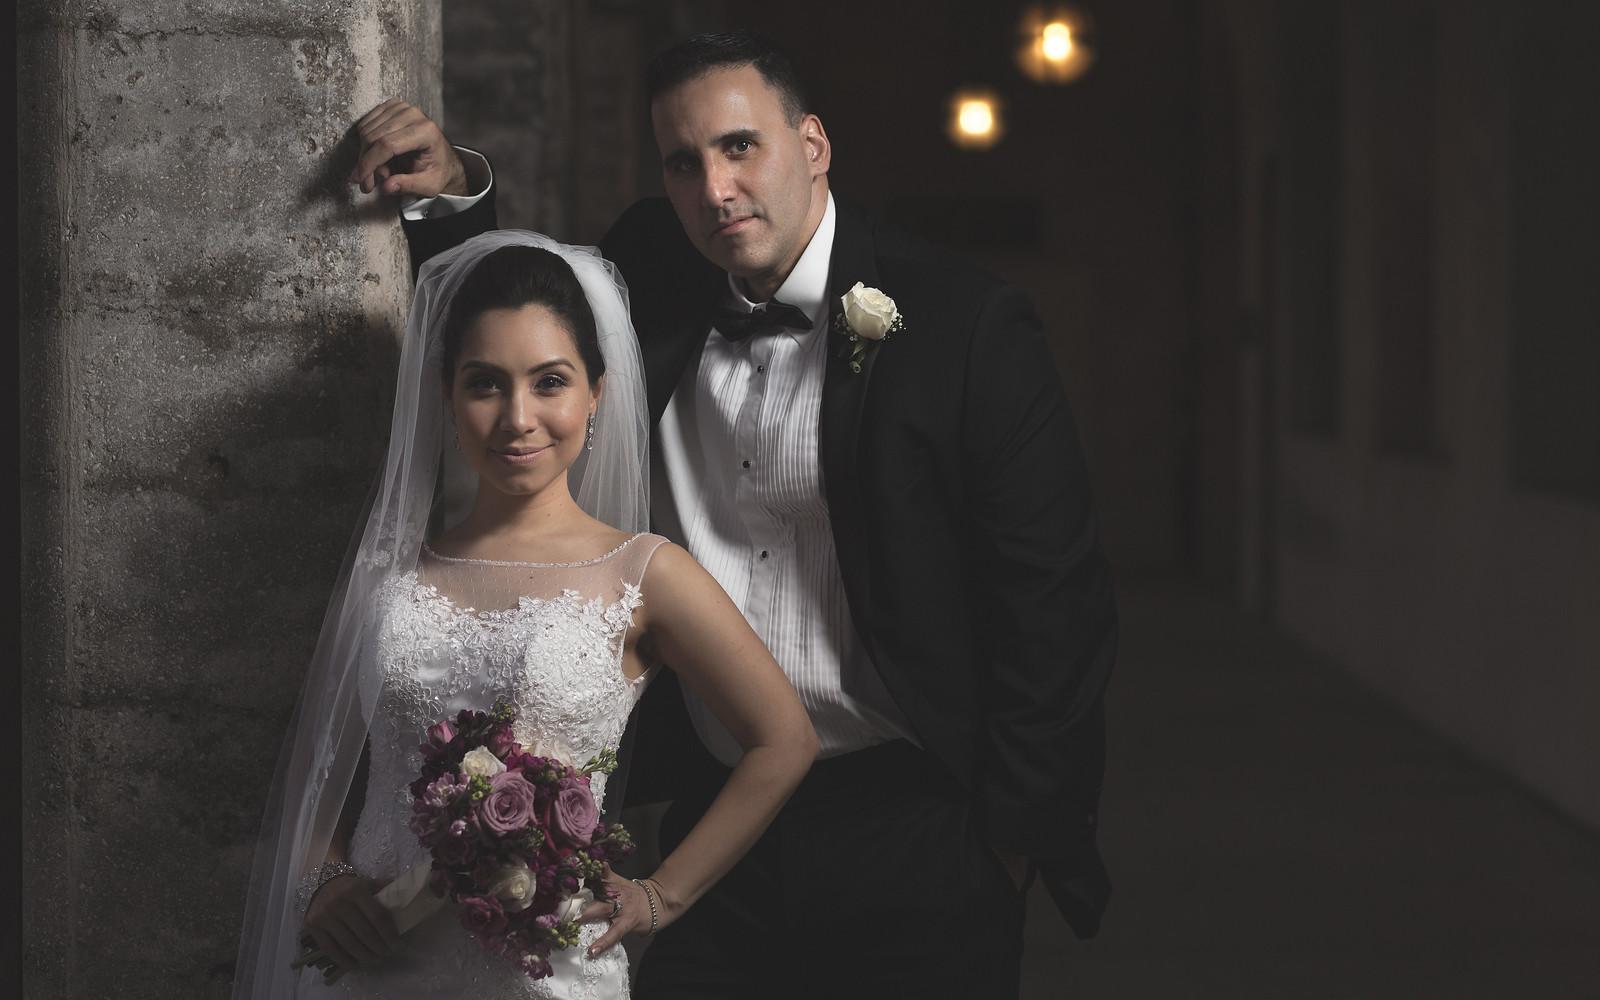 adam-szarmack-st-augustine-wedding-photographer-54.jpg